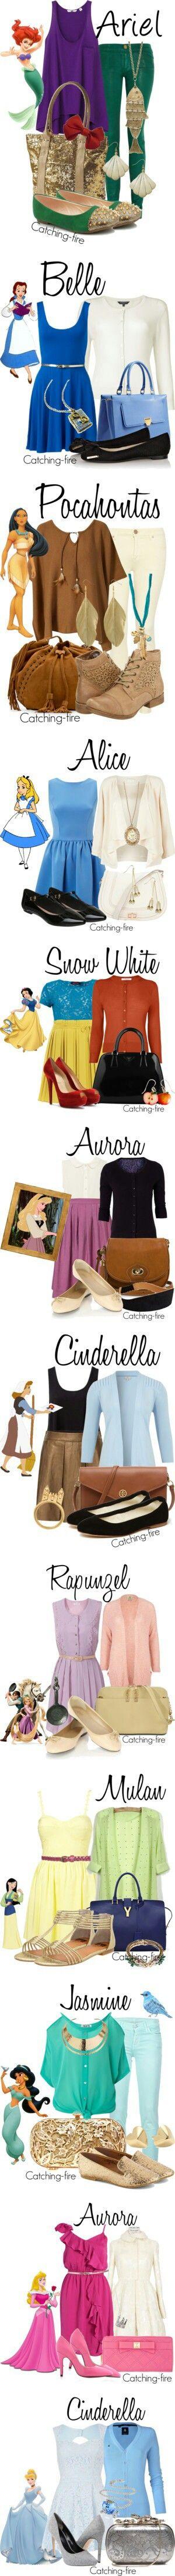 Disney! Love Phocahontas, Aurora and Cinderella the most <3